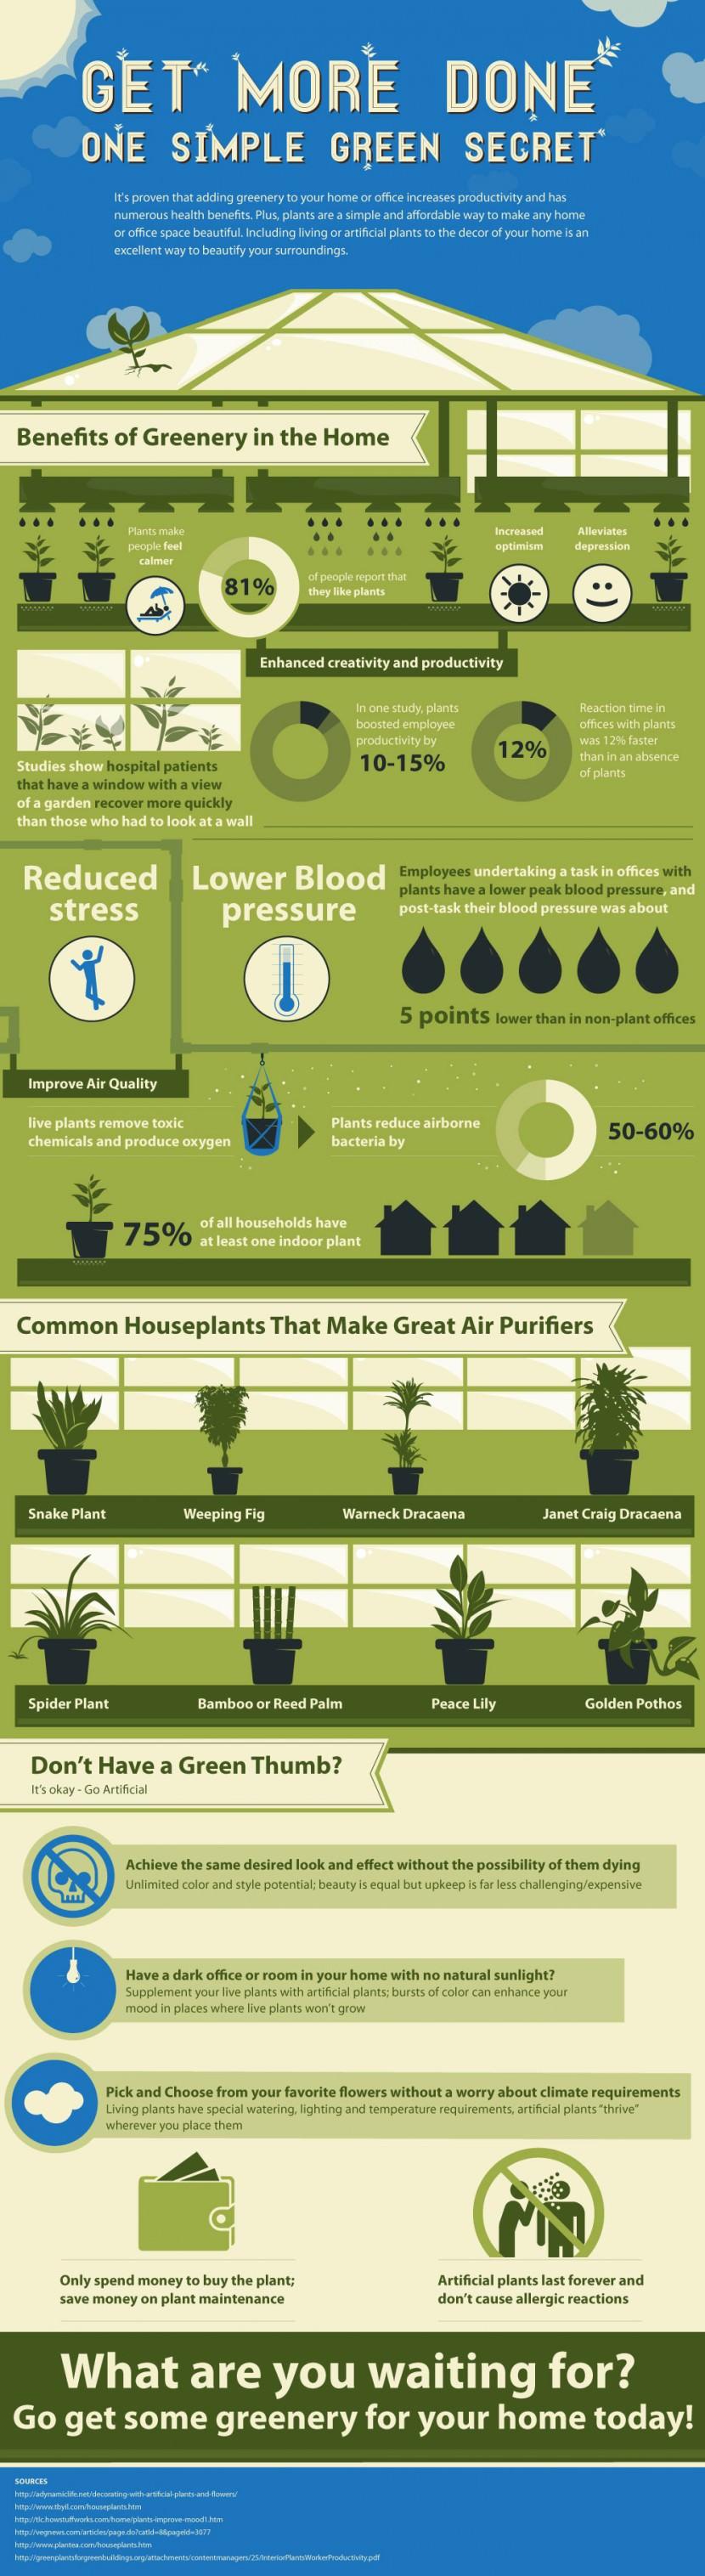 greenery infographic